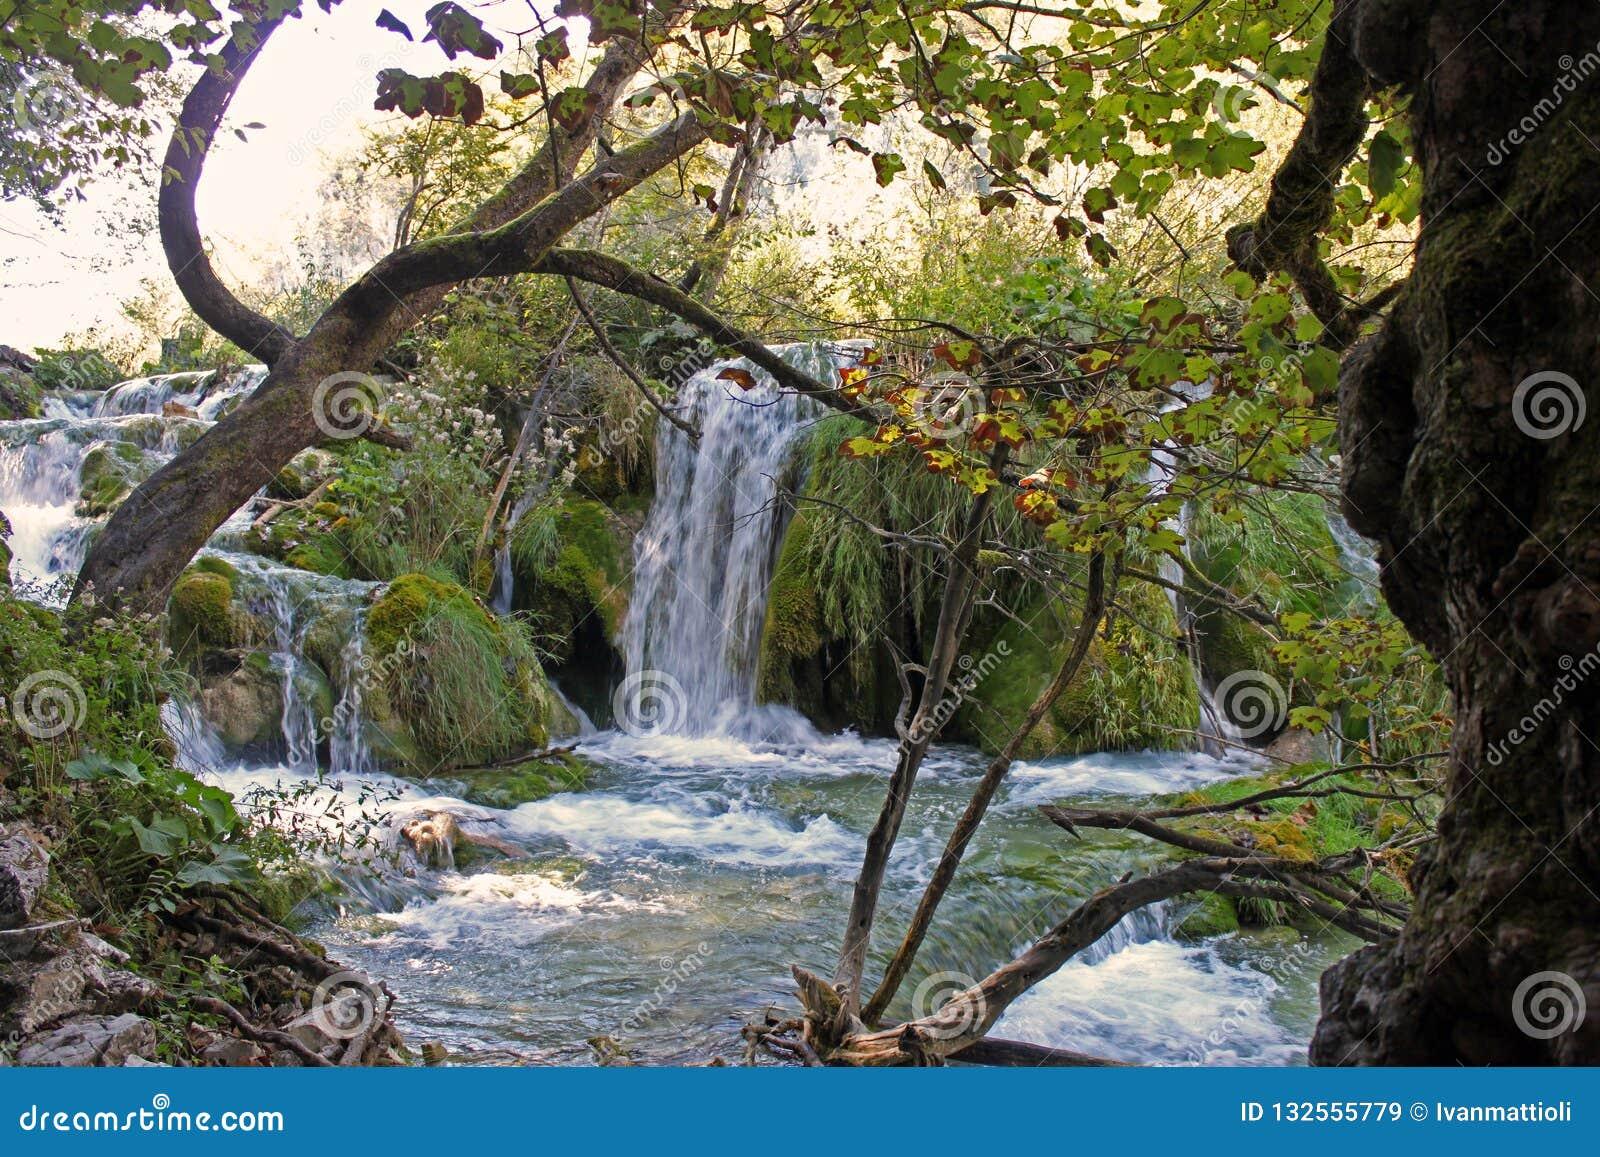 Каскад в национальном парке Хорватии Plitvice